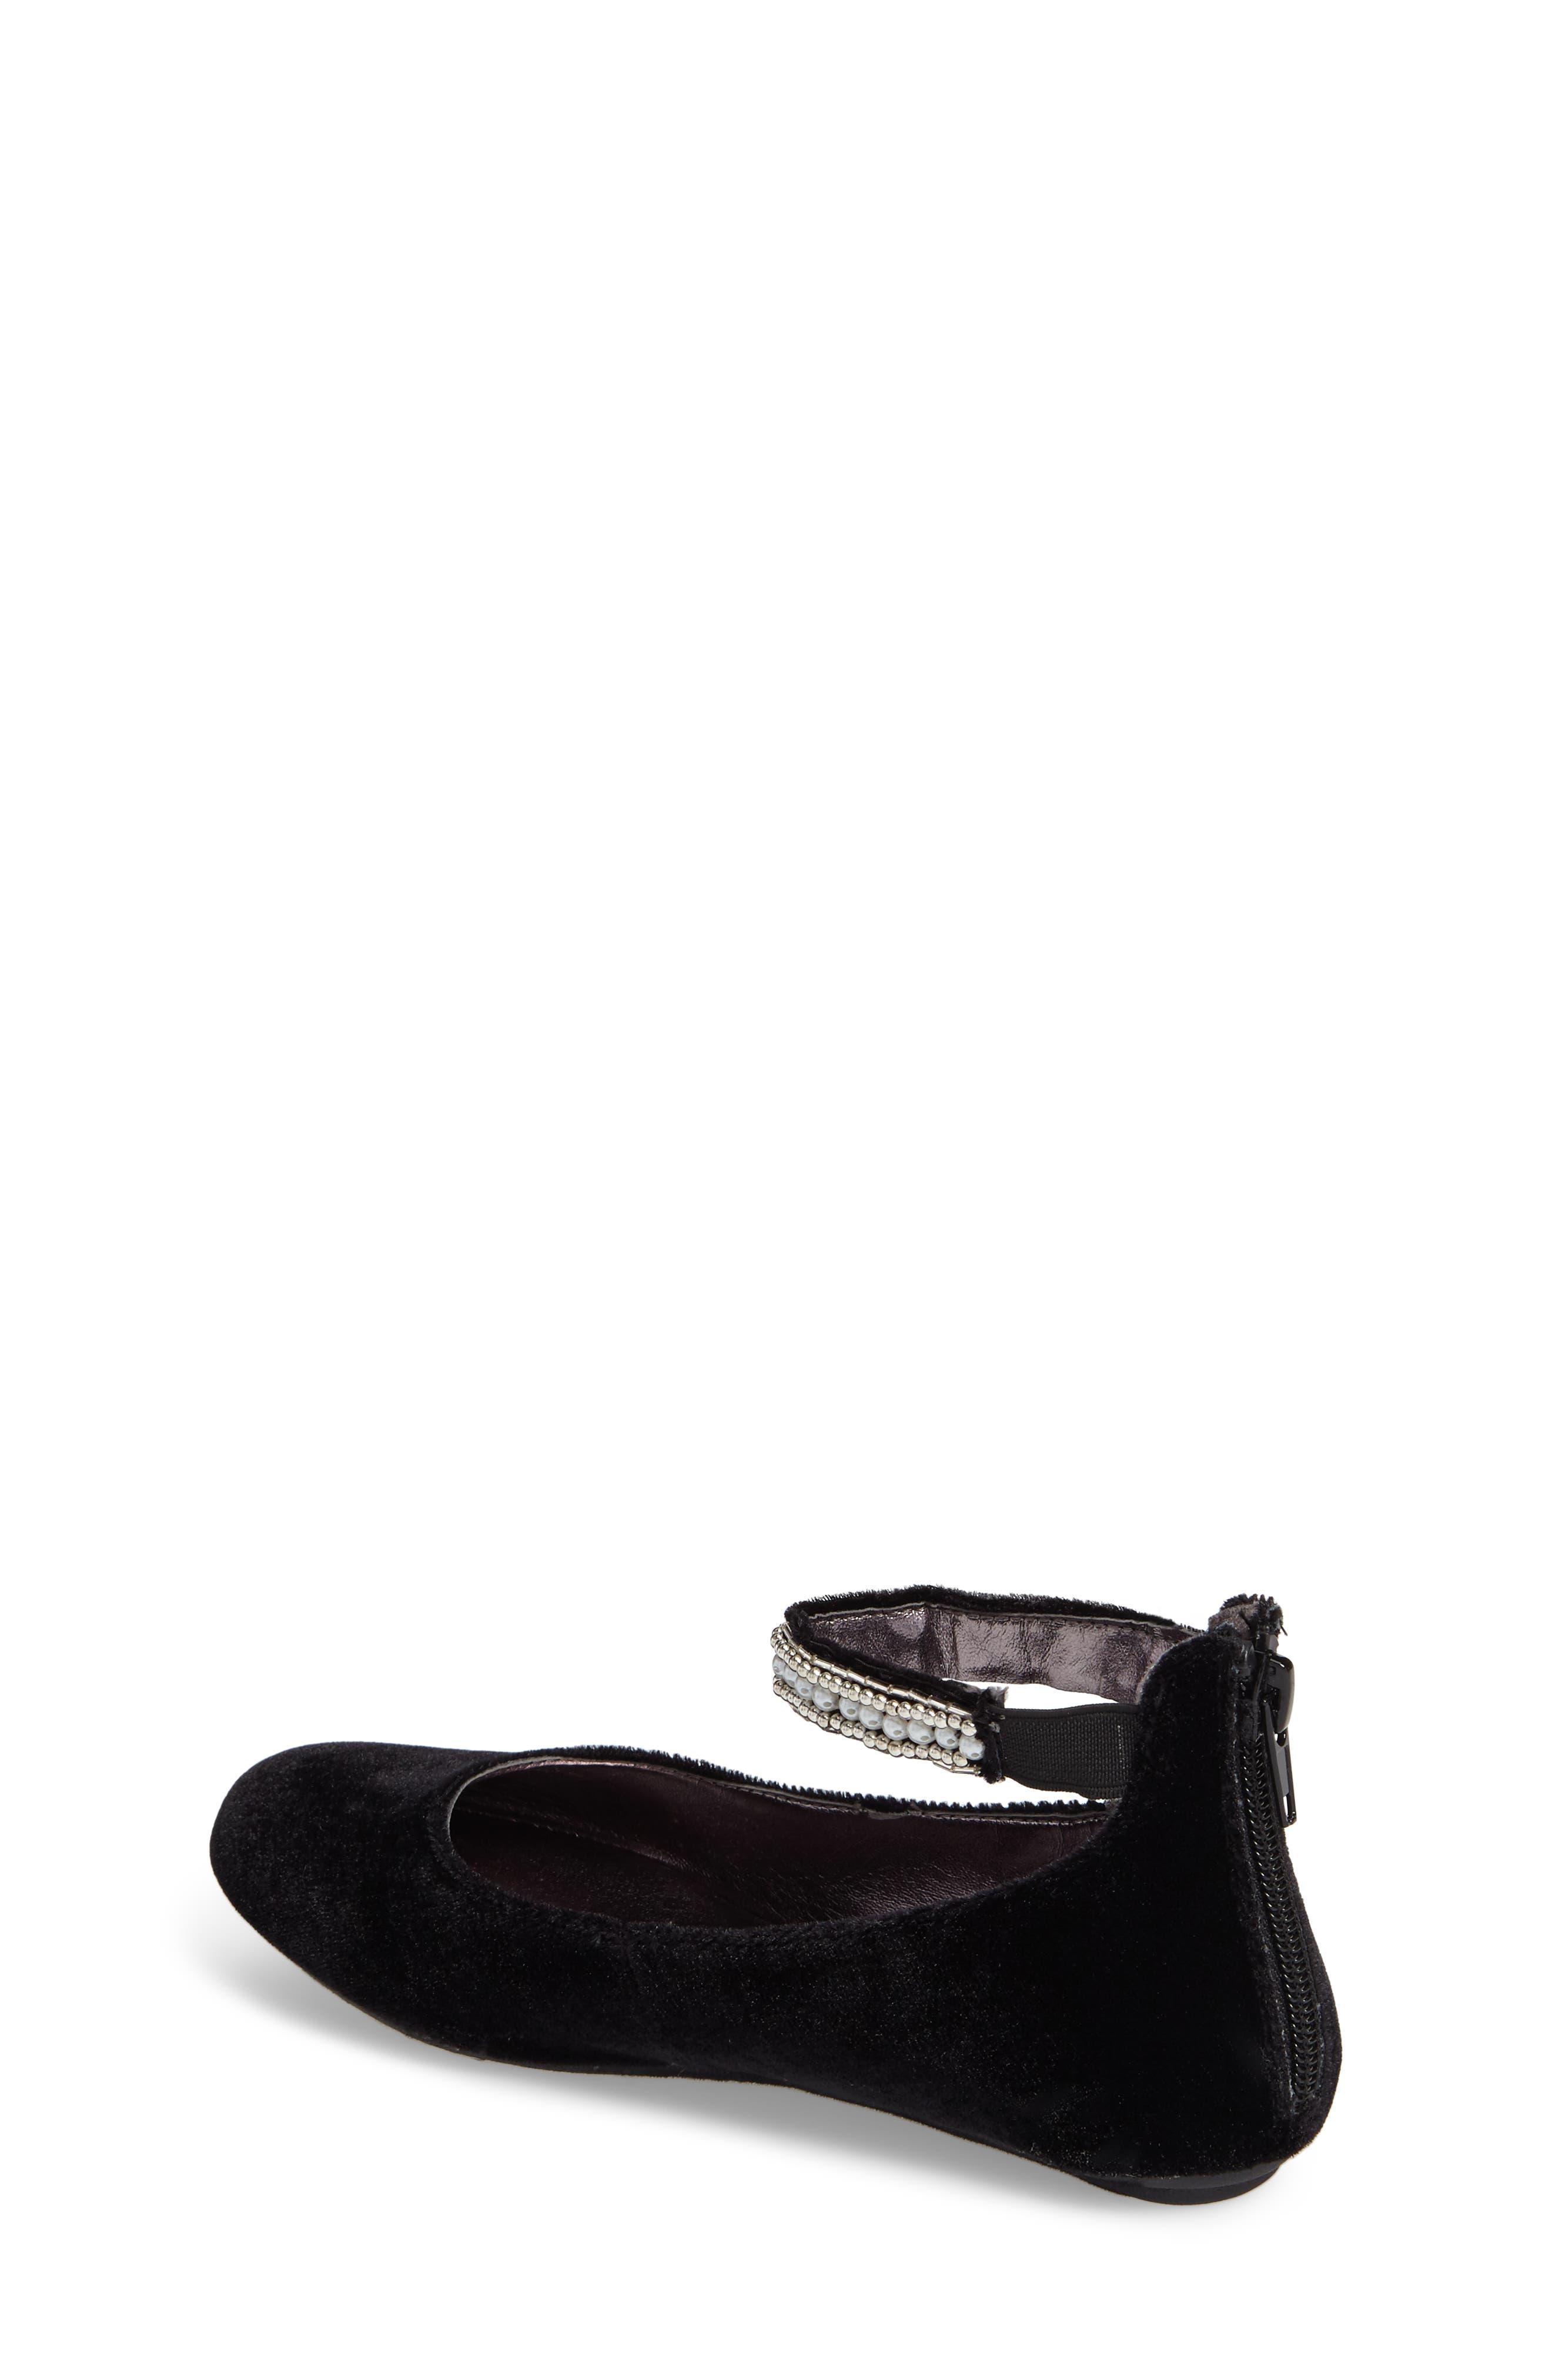 Zilerp Embellished Ankle Strap Flat,                             Alternate thumbnail 2, color,                             009